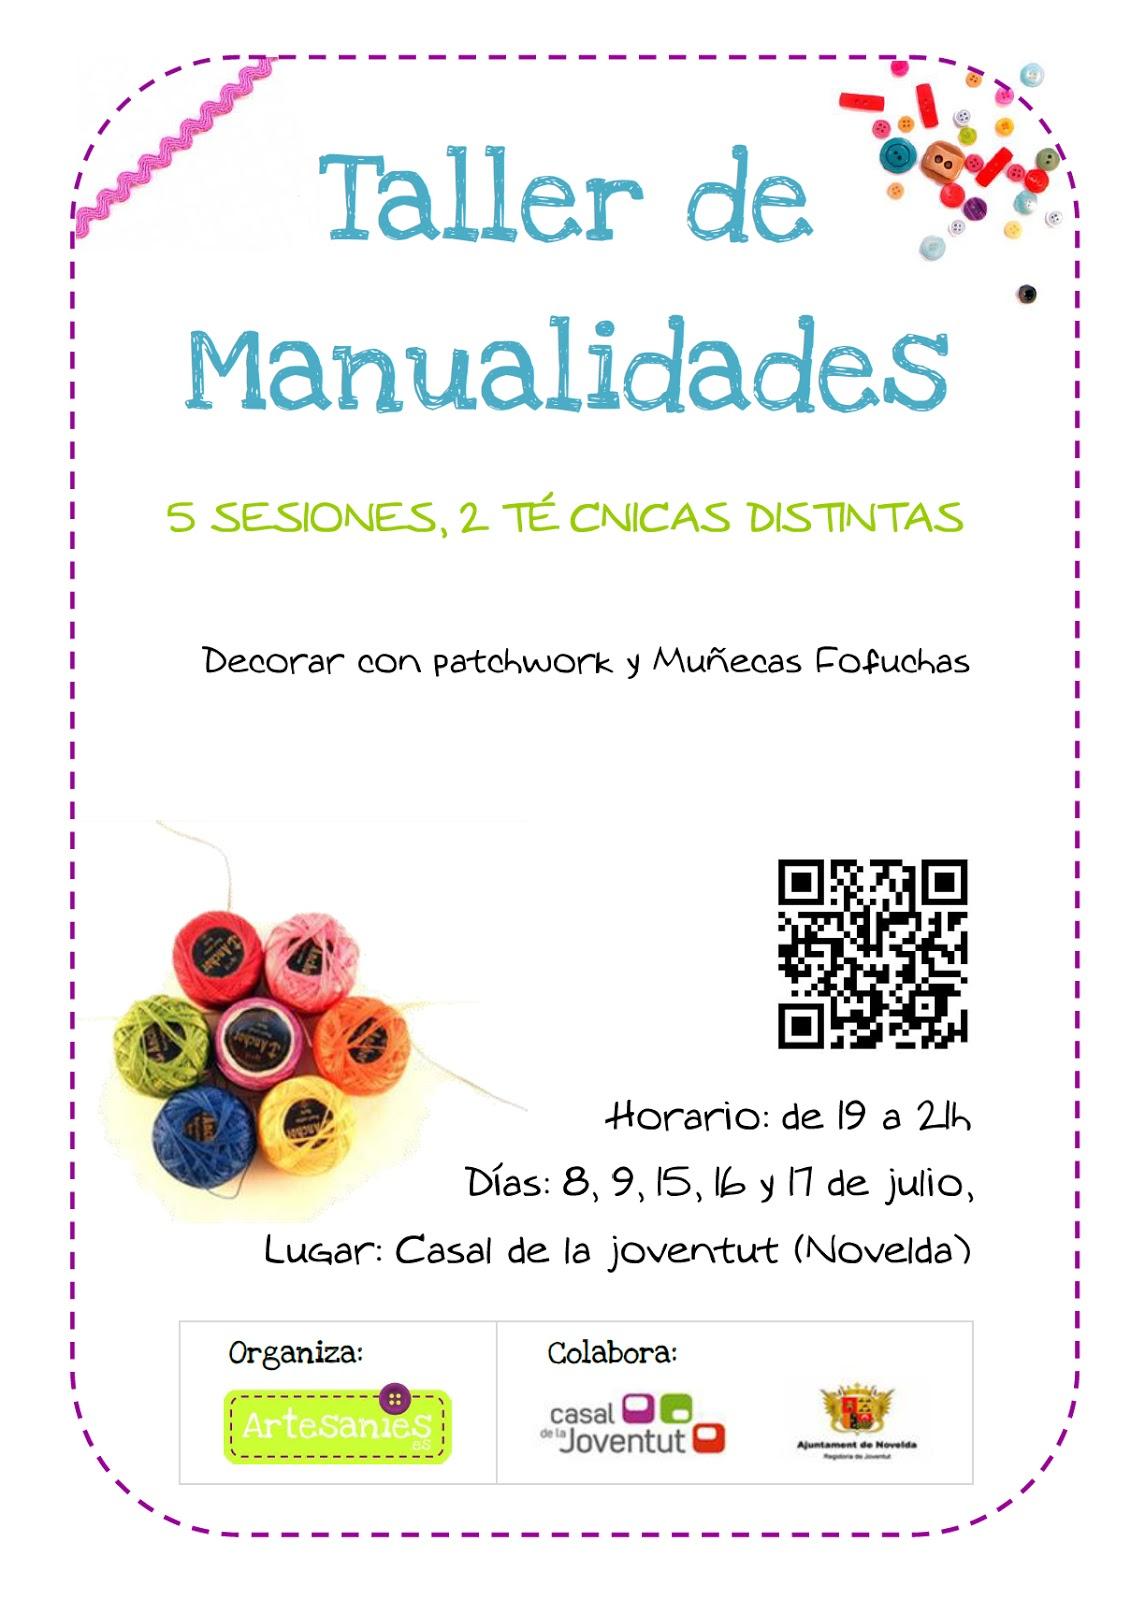 Taller de manualidades v 2 0 casal de la juventud - Talleres manualidades para adultos ...